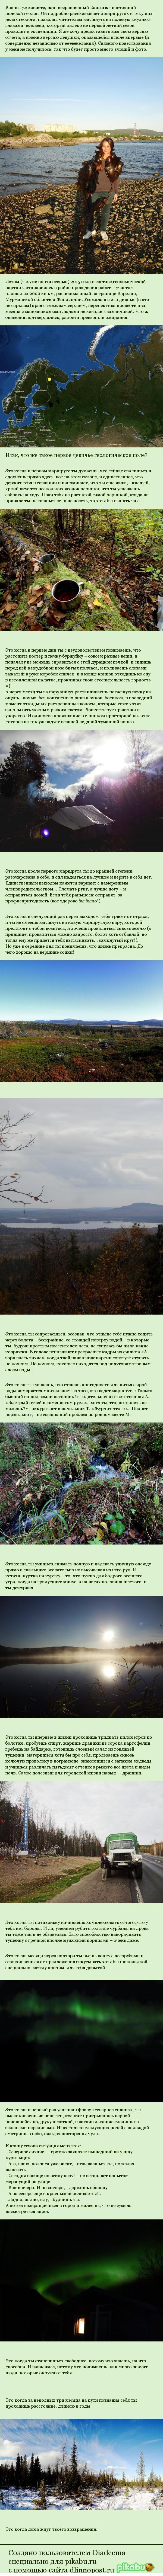 Заметки геолога. Женский взгляд. геологи, Карелия, девушки, 2015, длиннопост